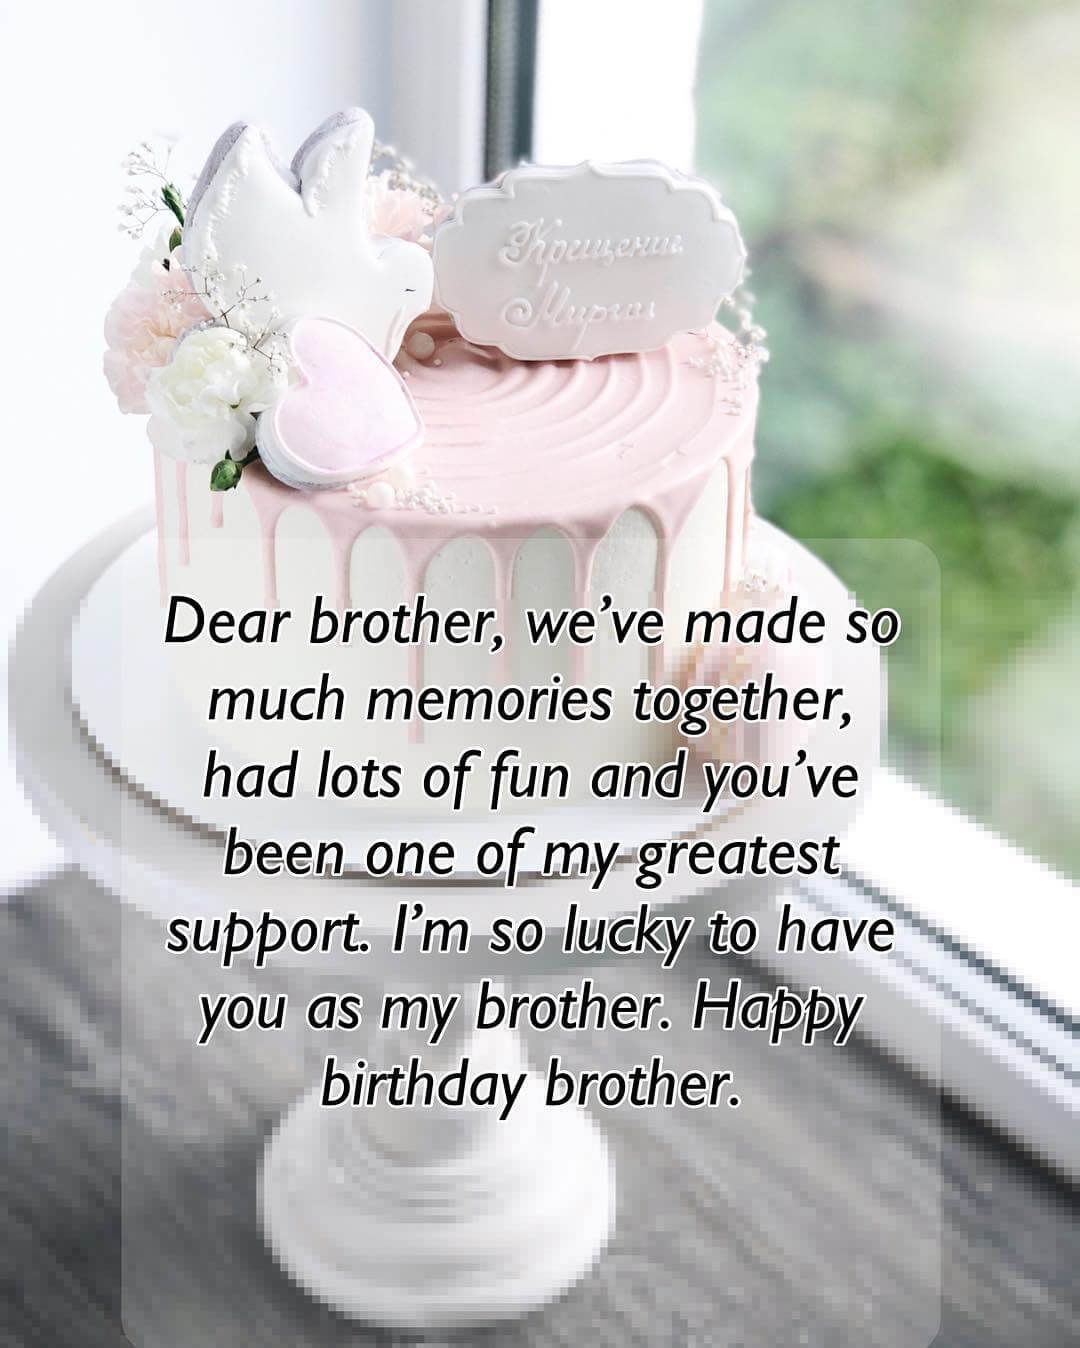 happy birthday whatsapp status for brother